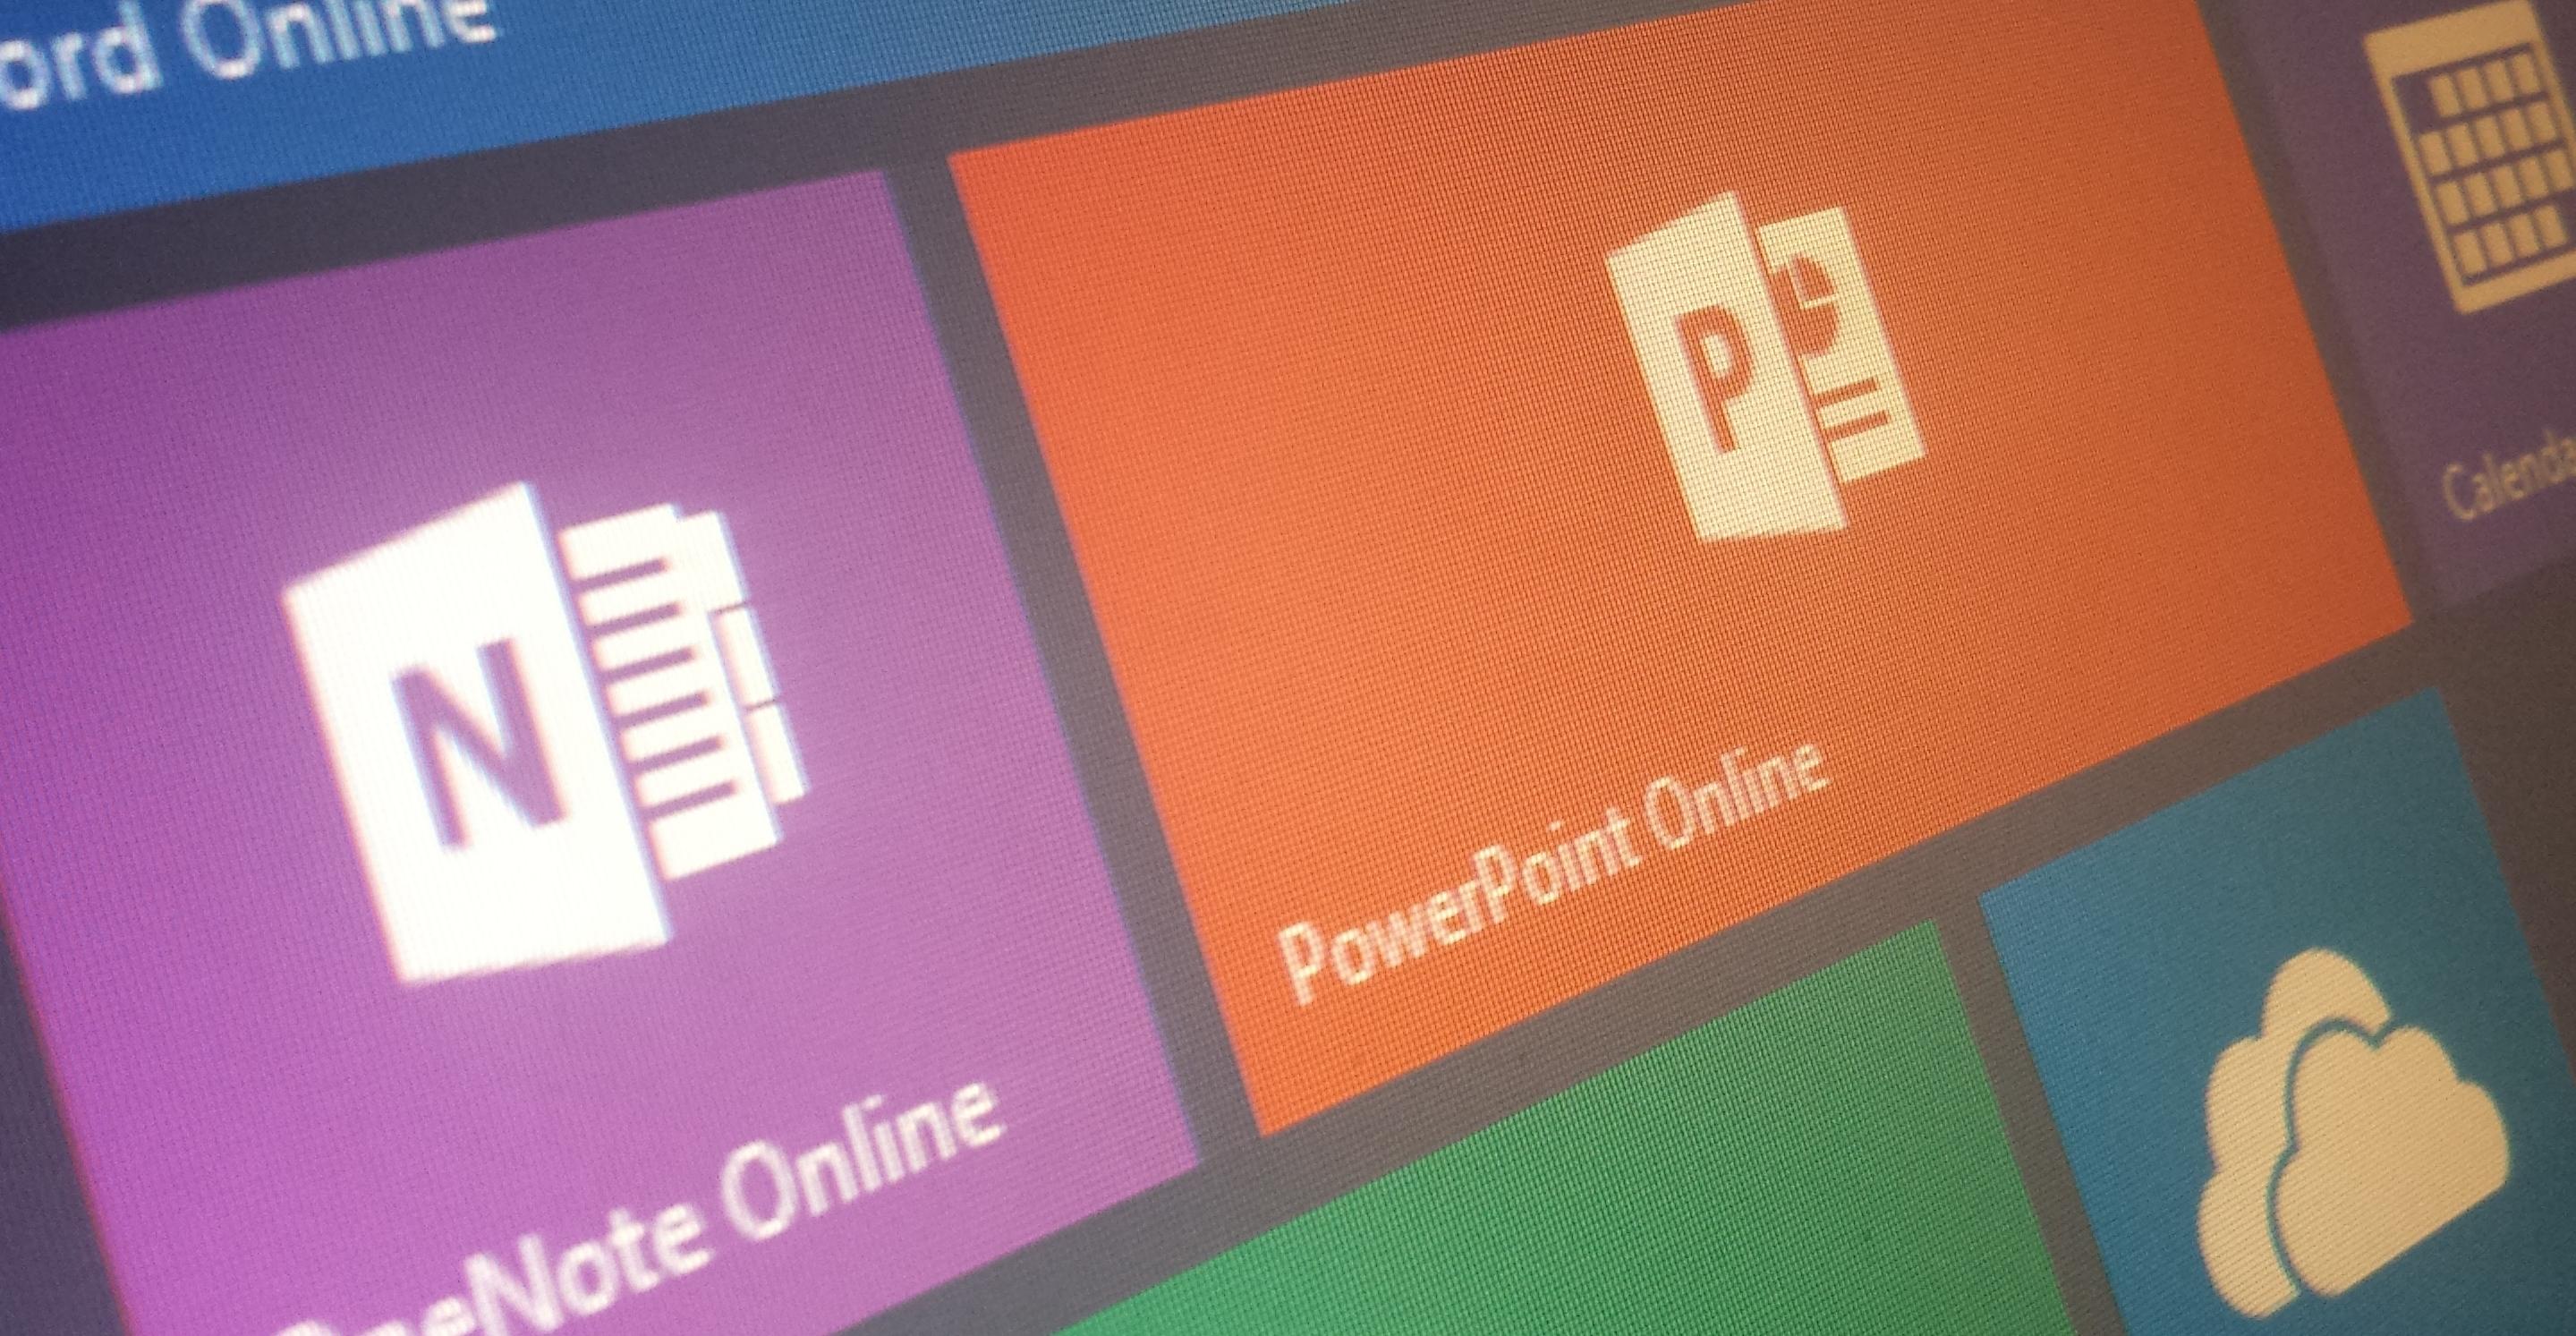 Microsoft Rebrands Office Web Apps as 'Office Online'